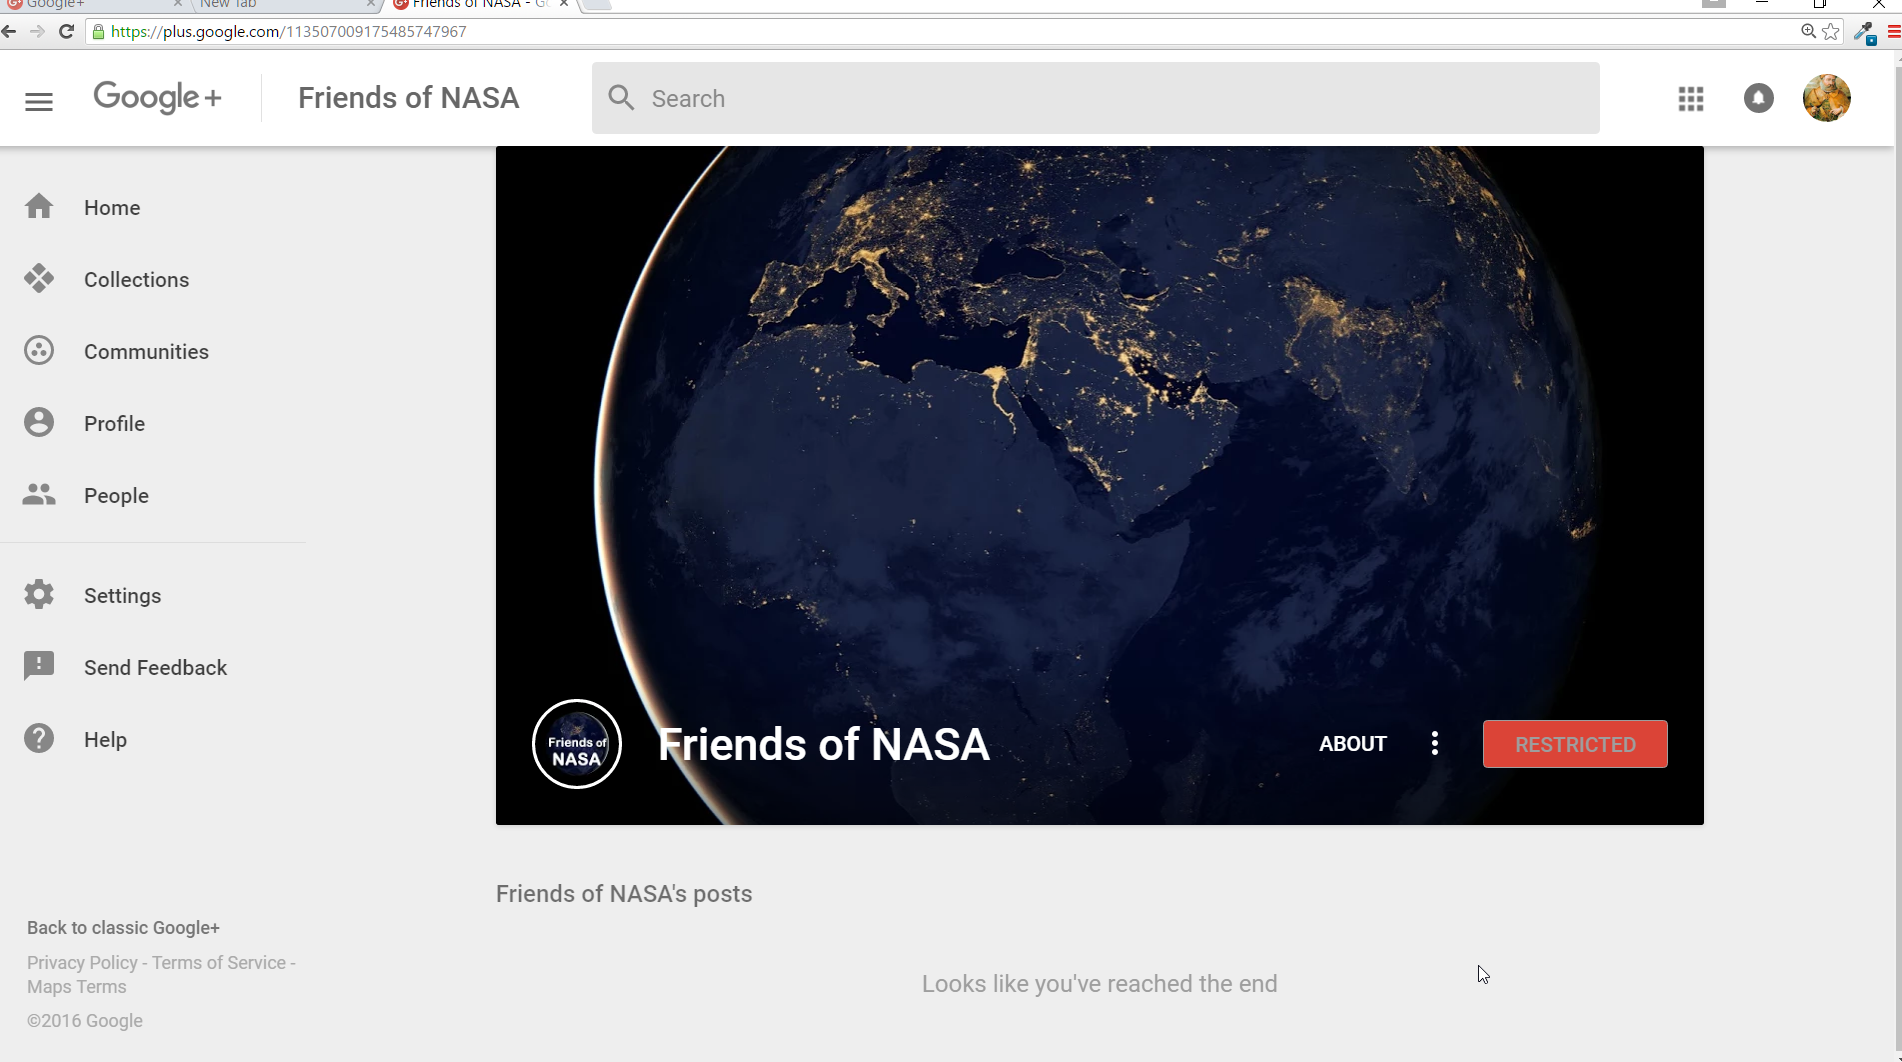 Friends of NASA